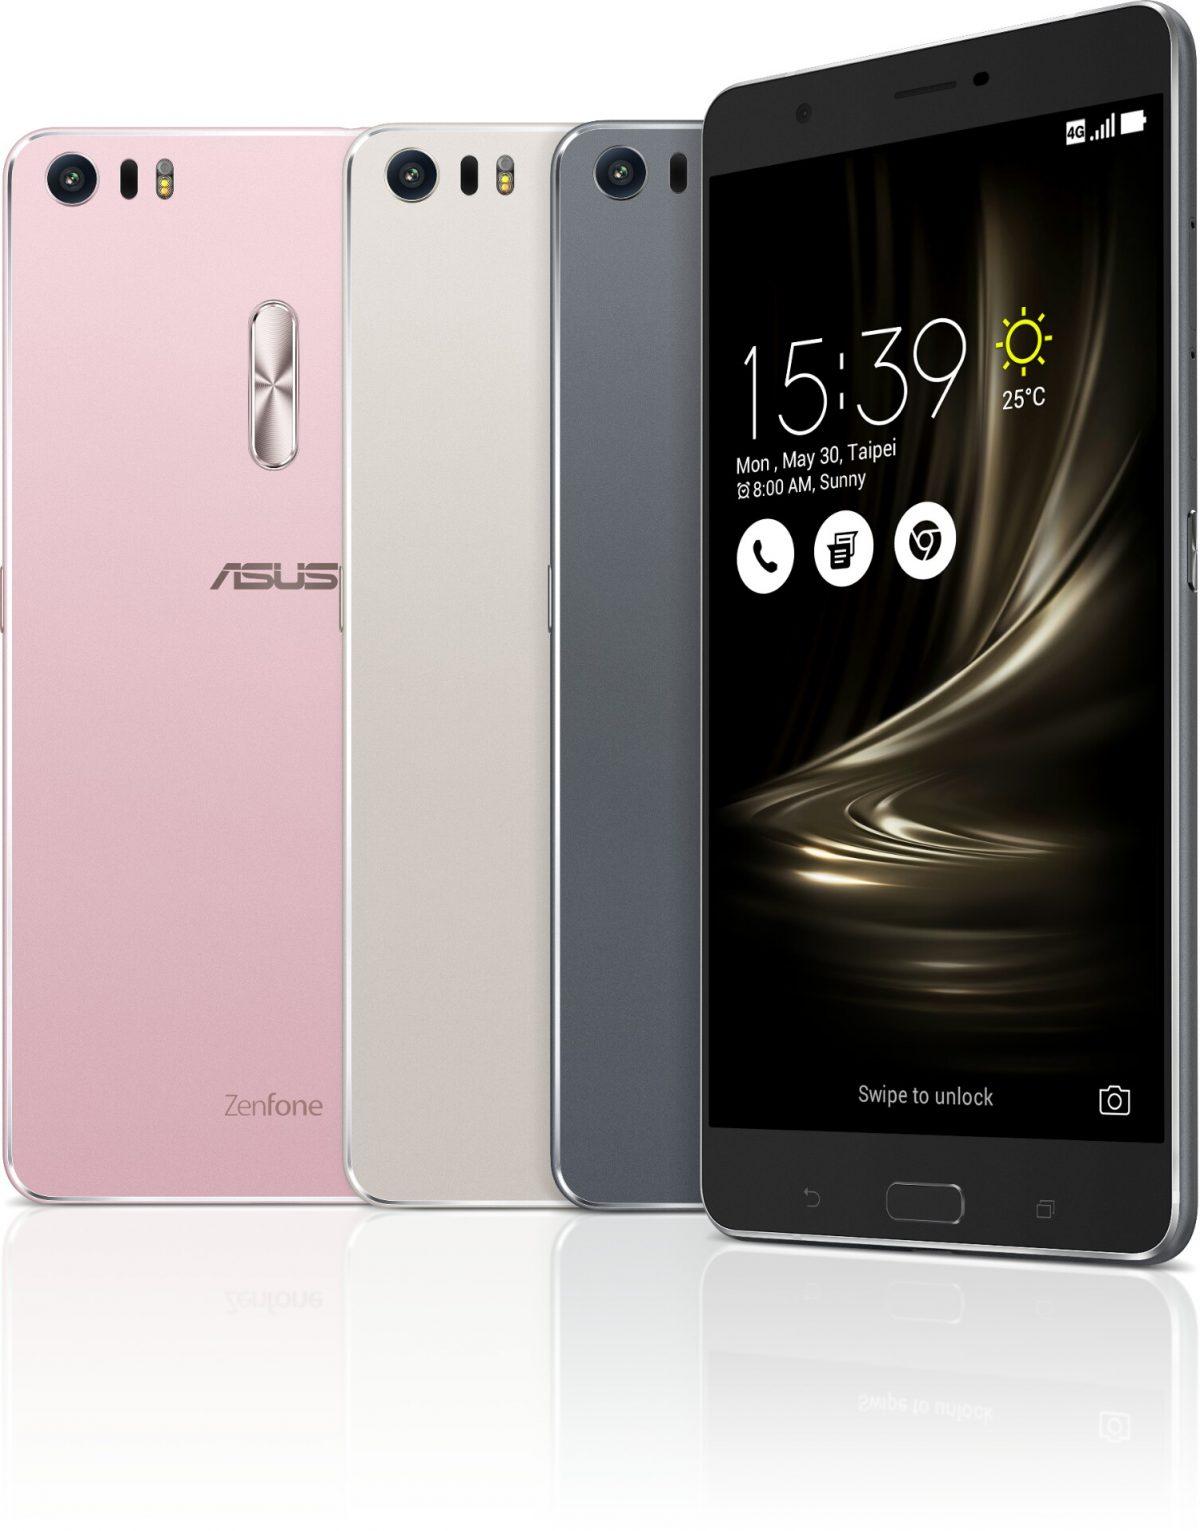 ASUS stellt das ZenFone 3, ZenFone 3 Ultra und ZenFone 3 Deluxe offiziell vor 1